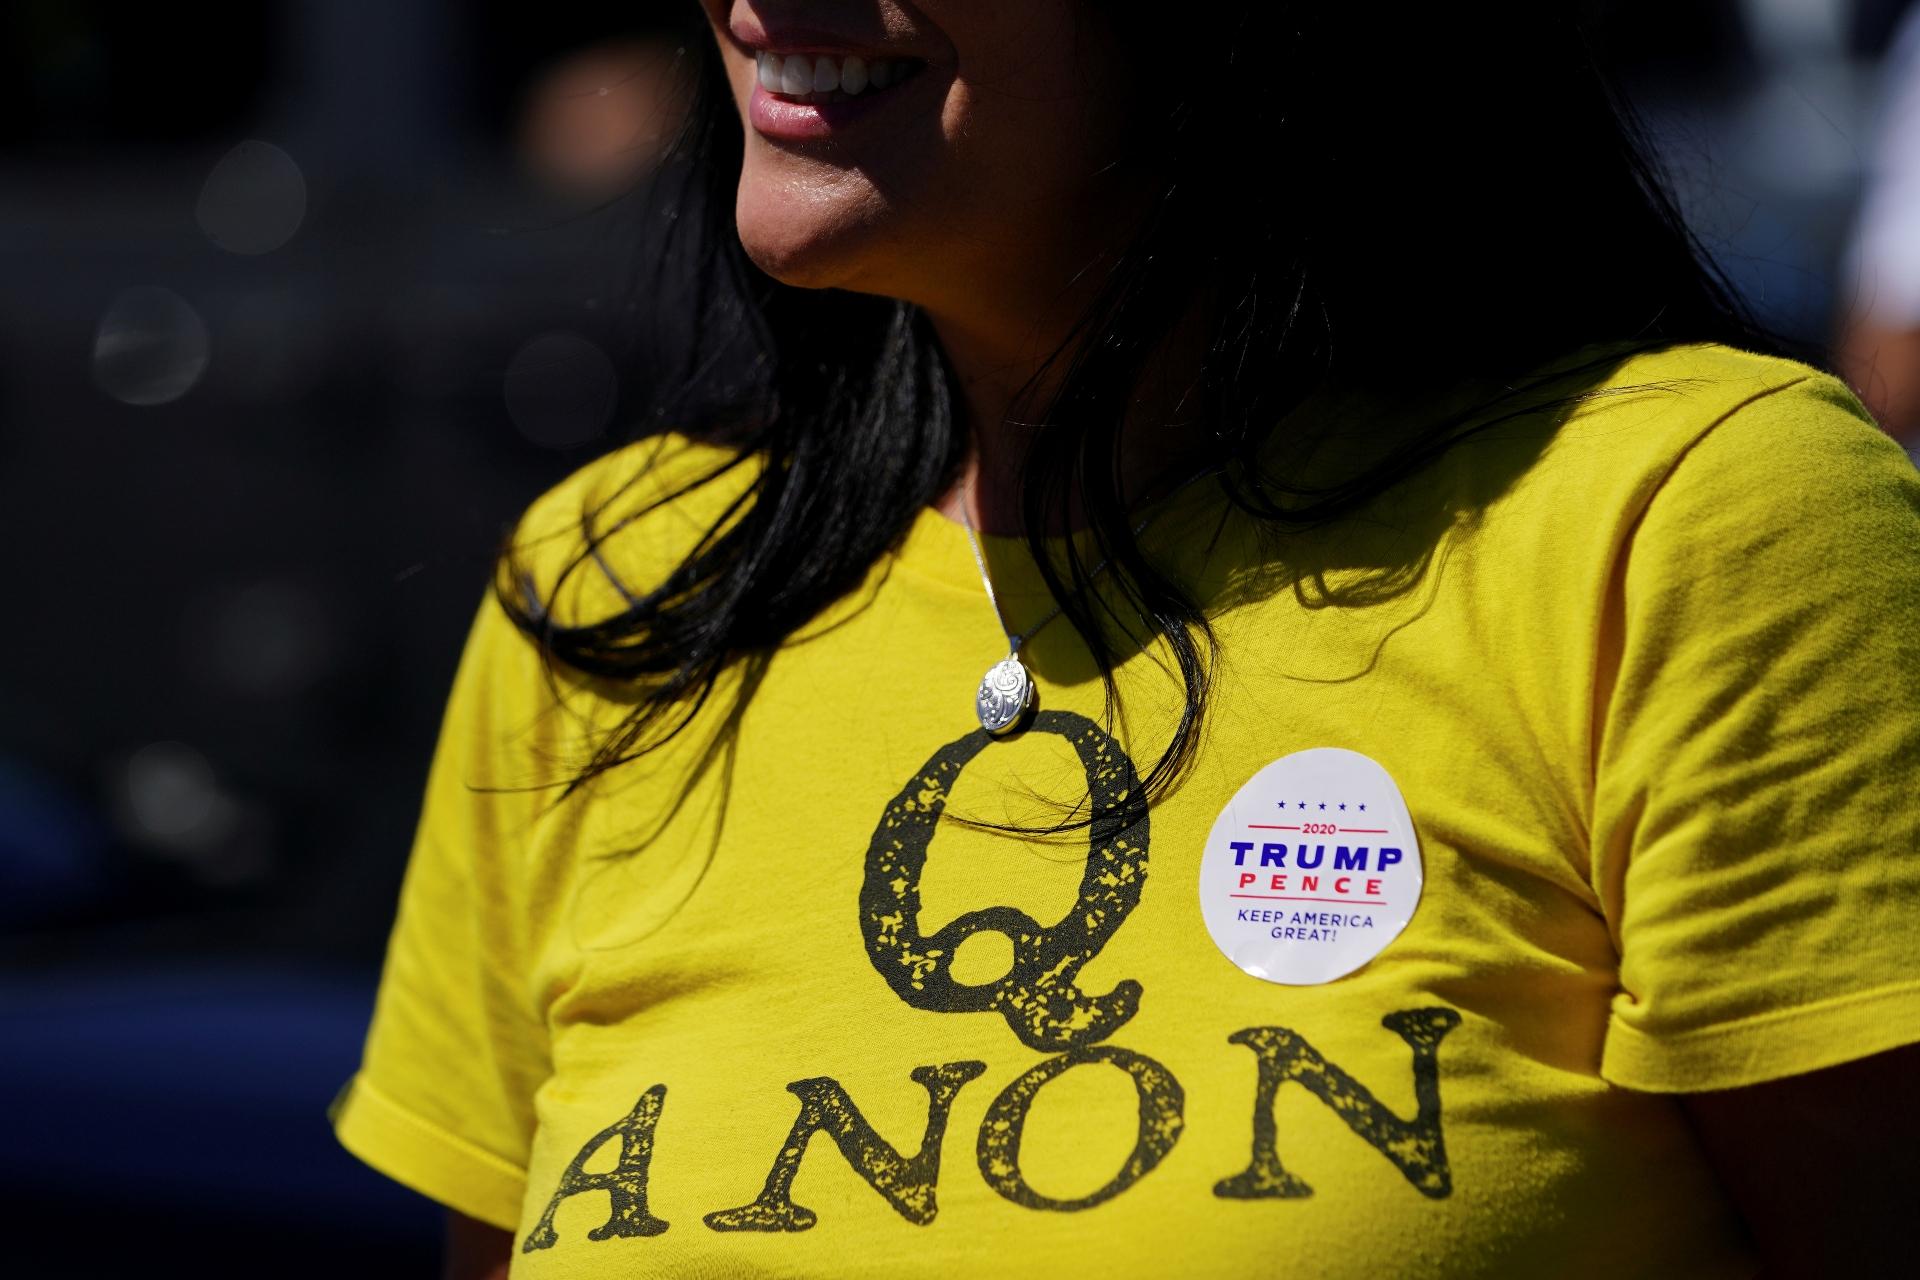 Apoiadora do presidente dos EUA, Donald Trump, com blusa do gruo QAnon